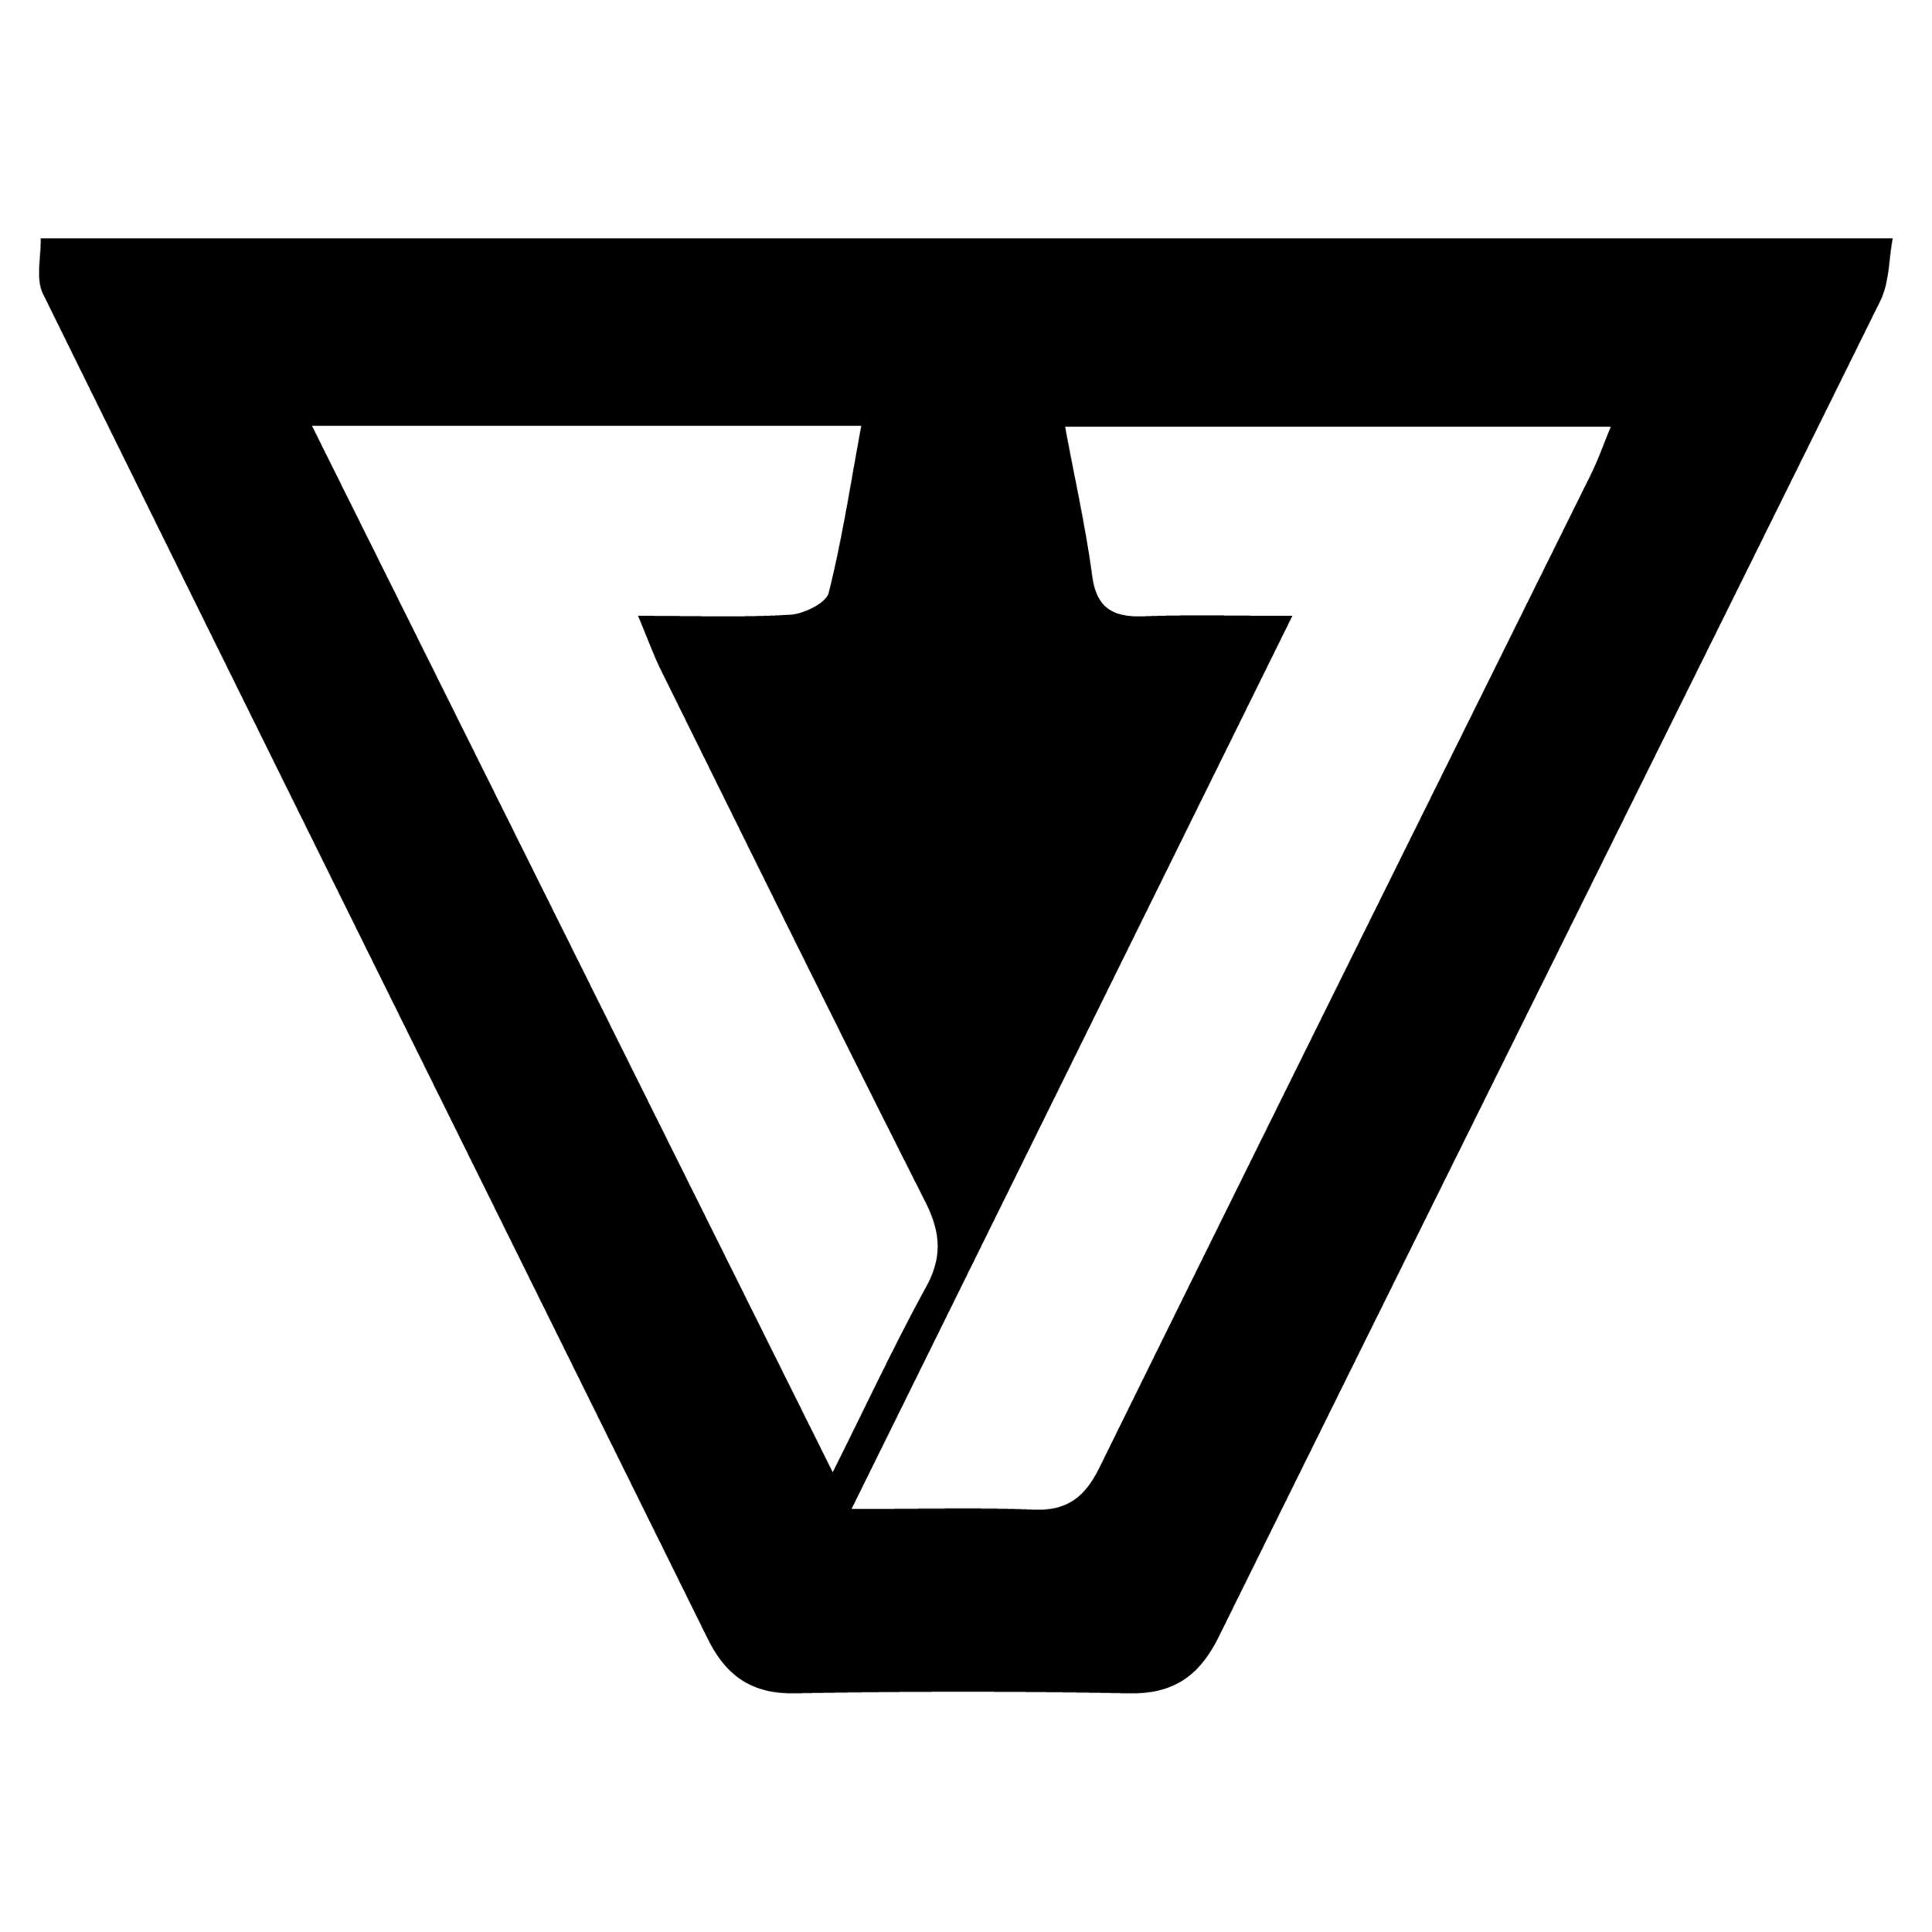 VISSLA-01.png